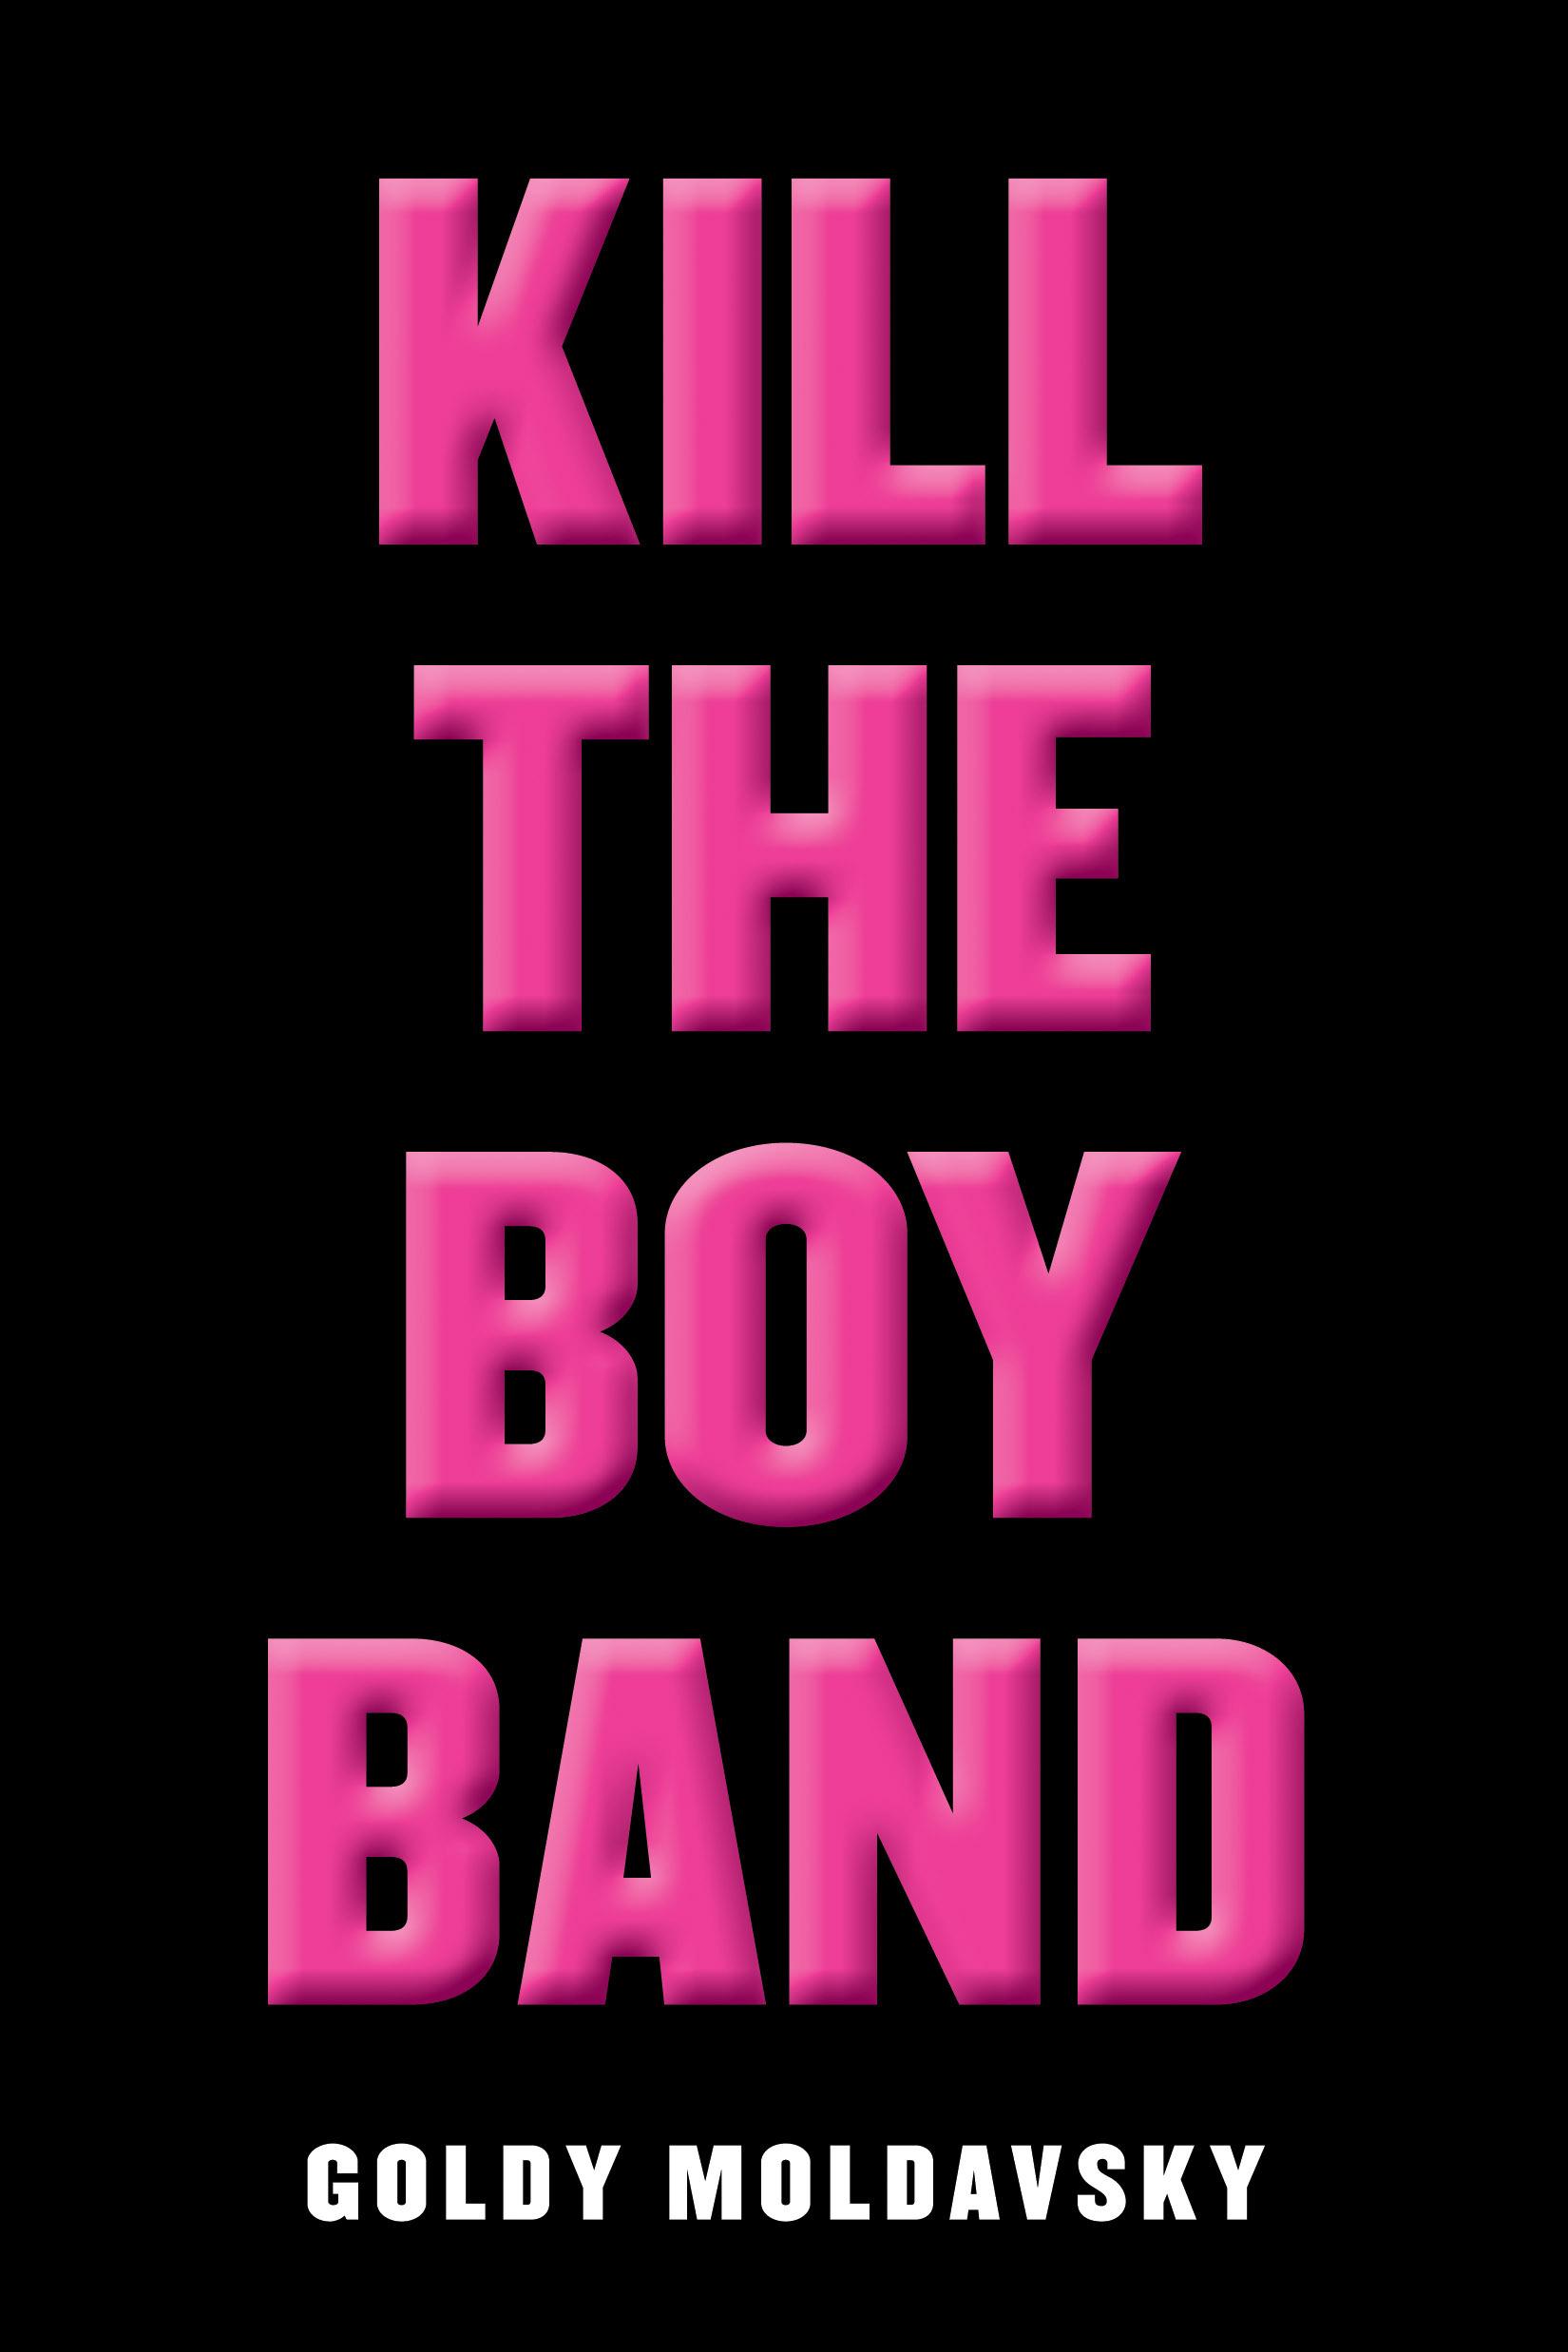 Goldy Moldavsky - Kill the Boy Band